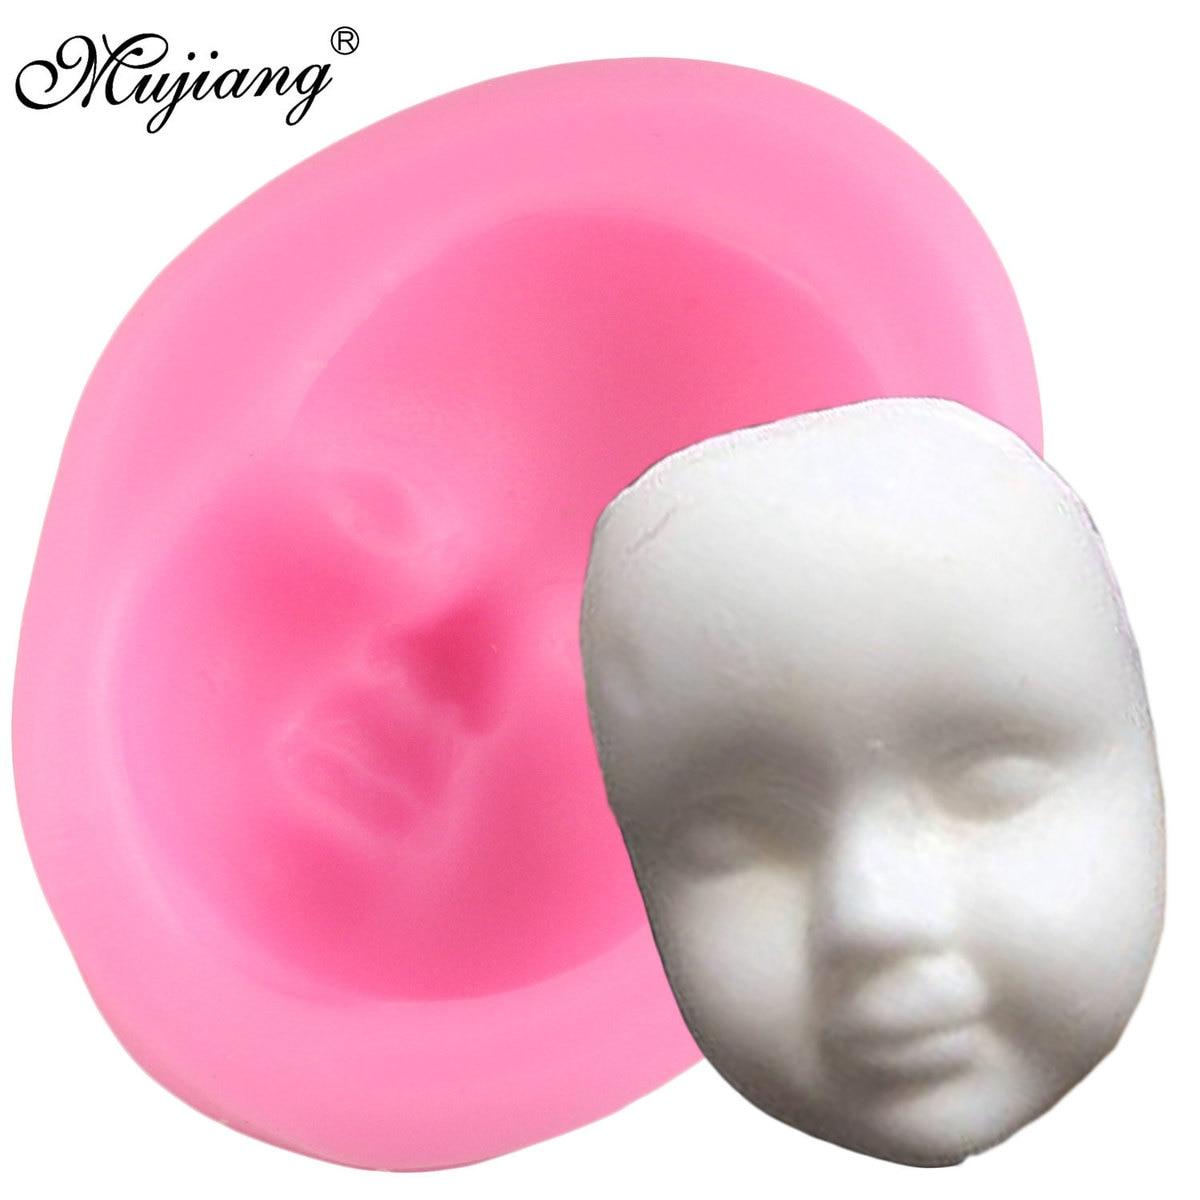 Molde de silicona para cara de bebé 3D, utensilios para decoración de tortas con fondant, arcilla polimérica, Chocolate, caramelo, pasta de azúcar, moldes para arcilla y jabón